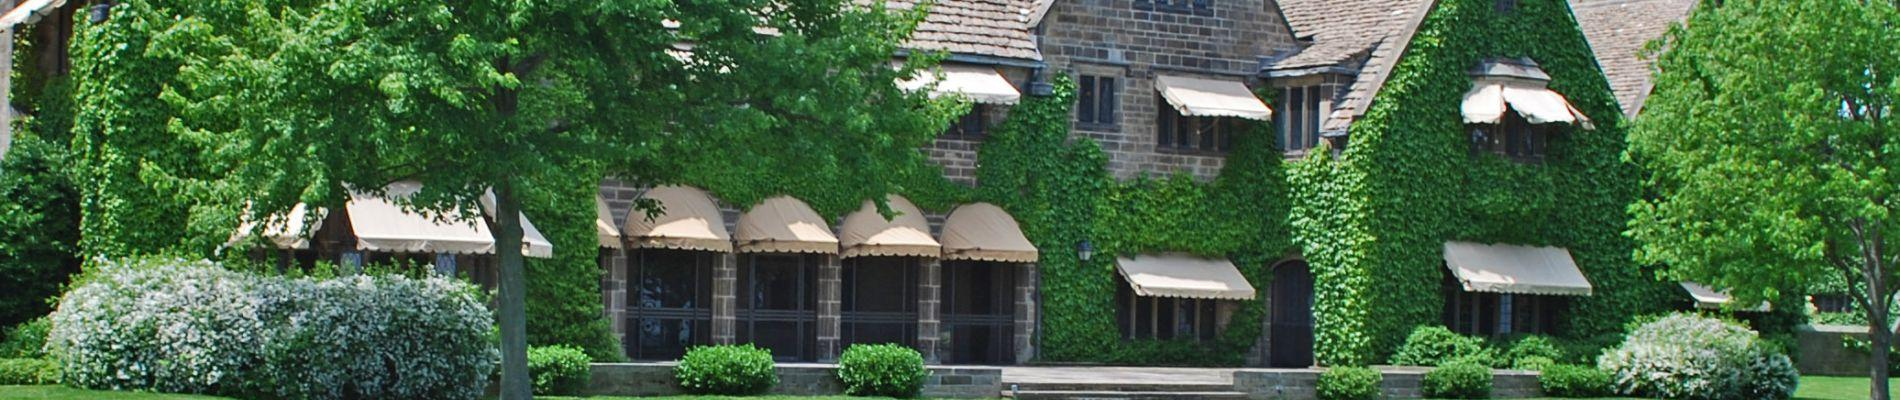 Edsel & Eleanor Ford House & Gardens Tour